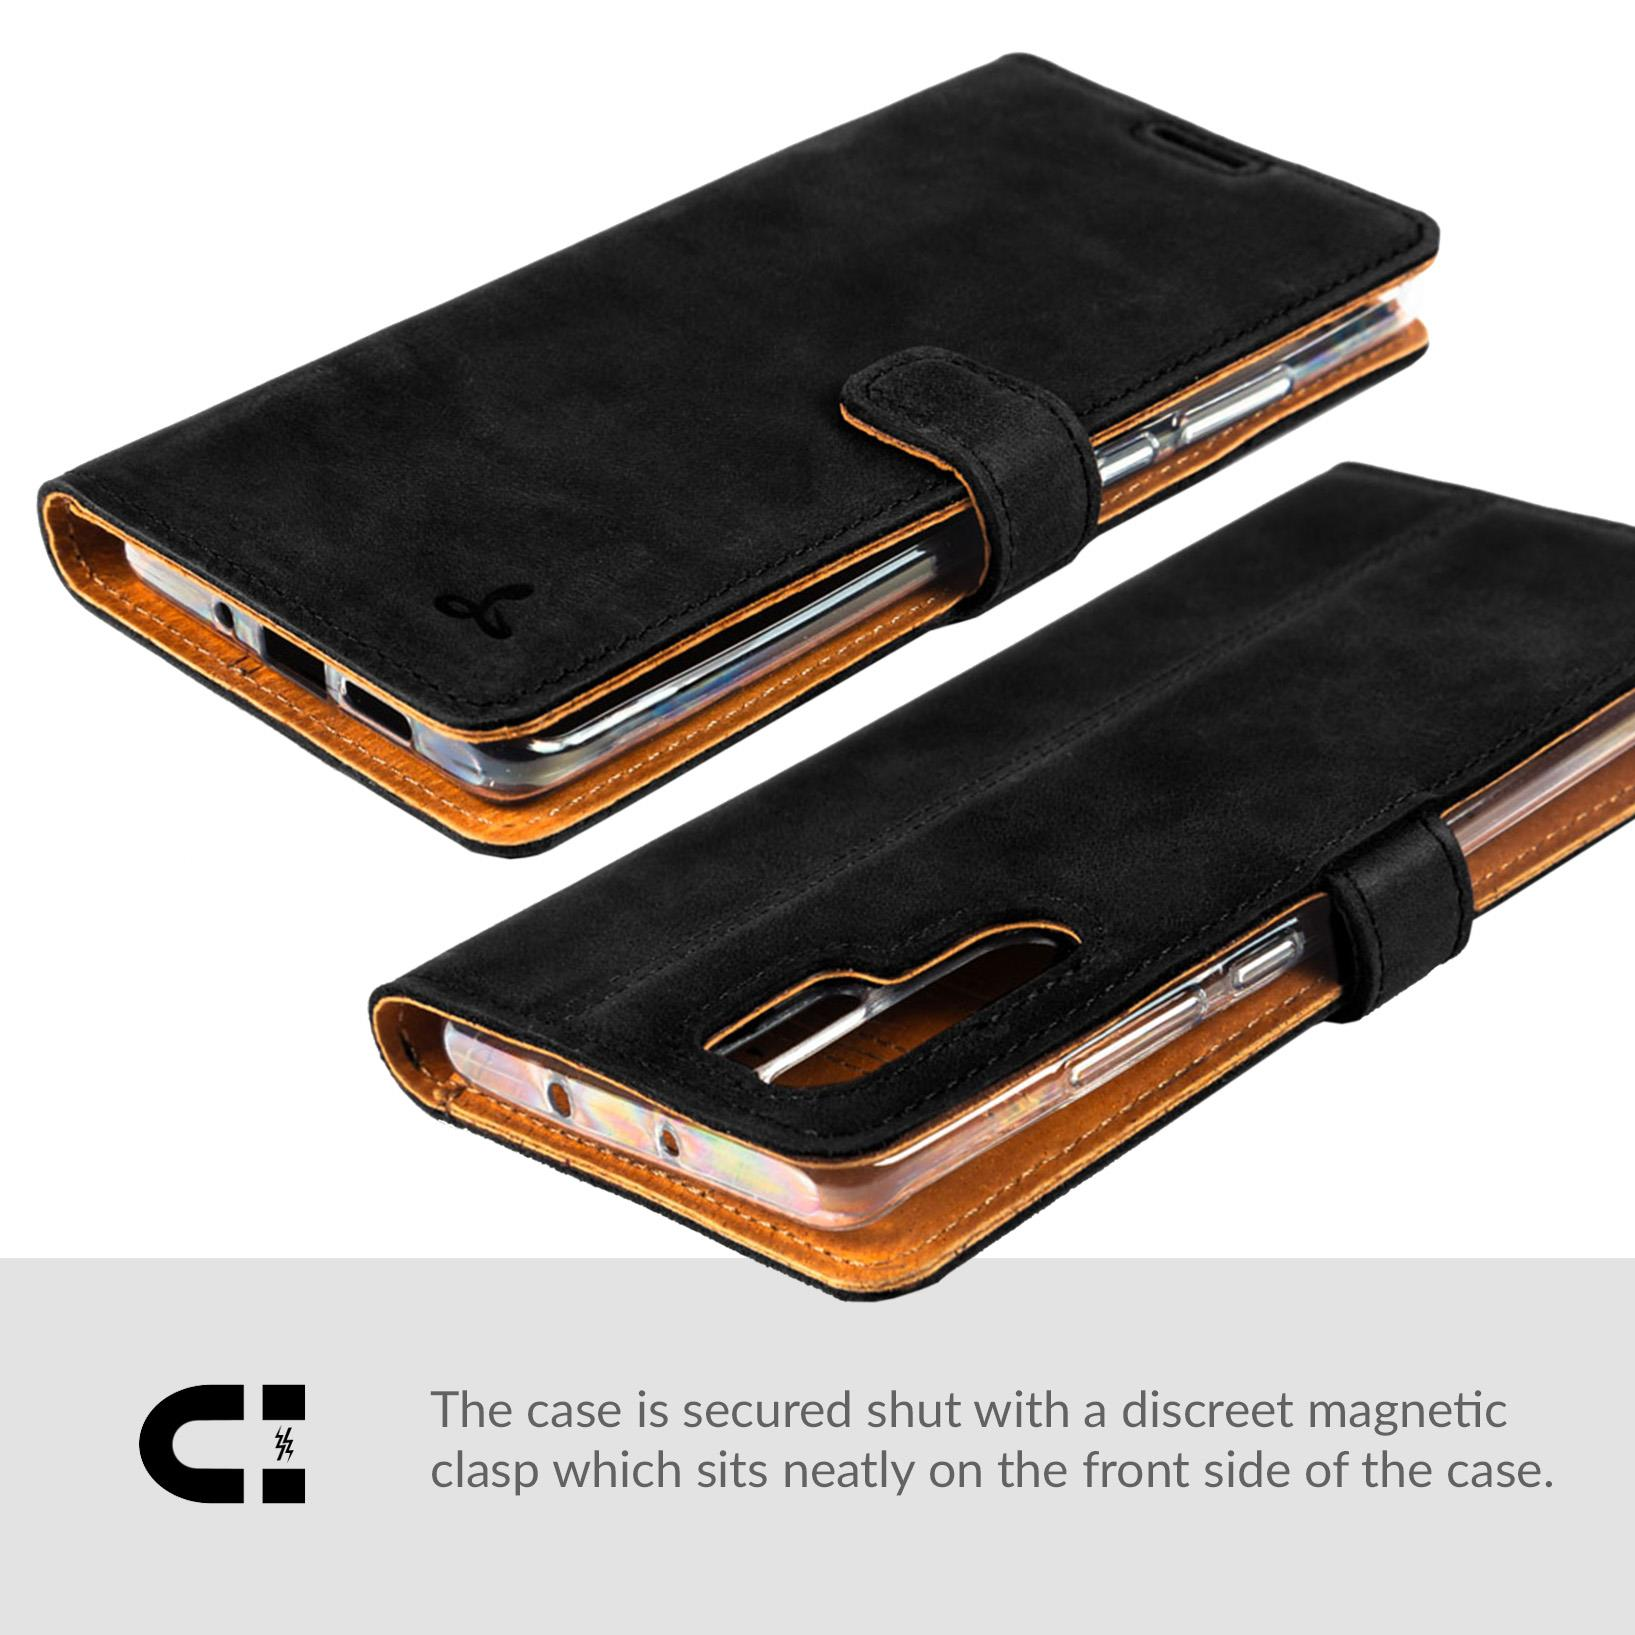 Snakehive-Huawei-P30-Pro-Premium-Genuine-Leather-Wallet-Case-w-Card-Slots thumbnail 5